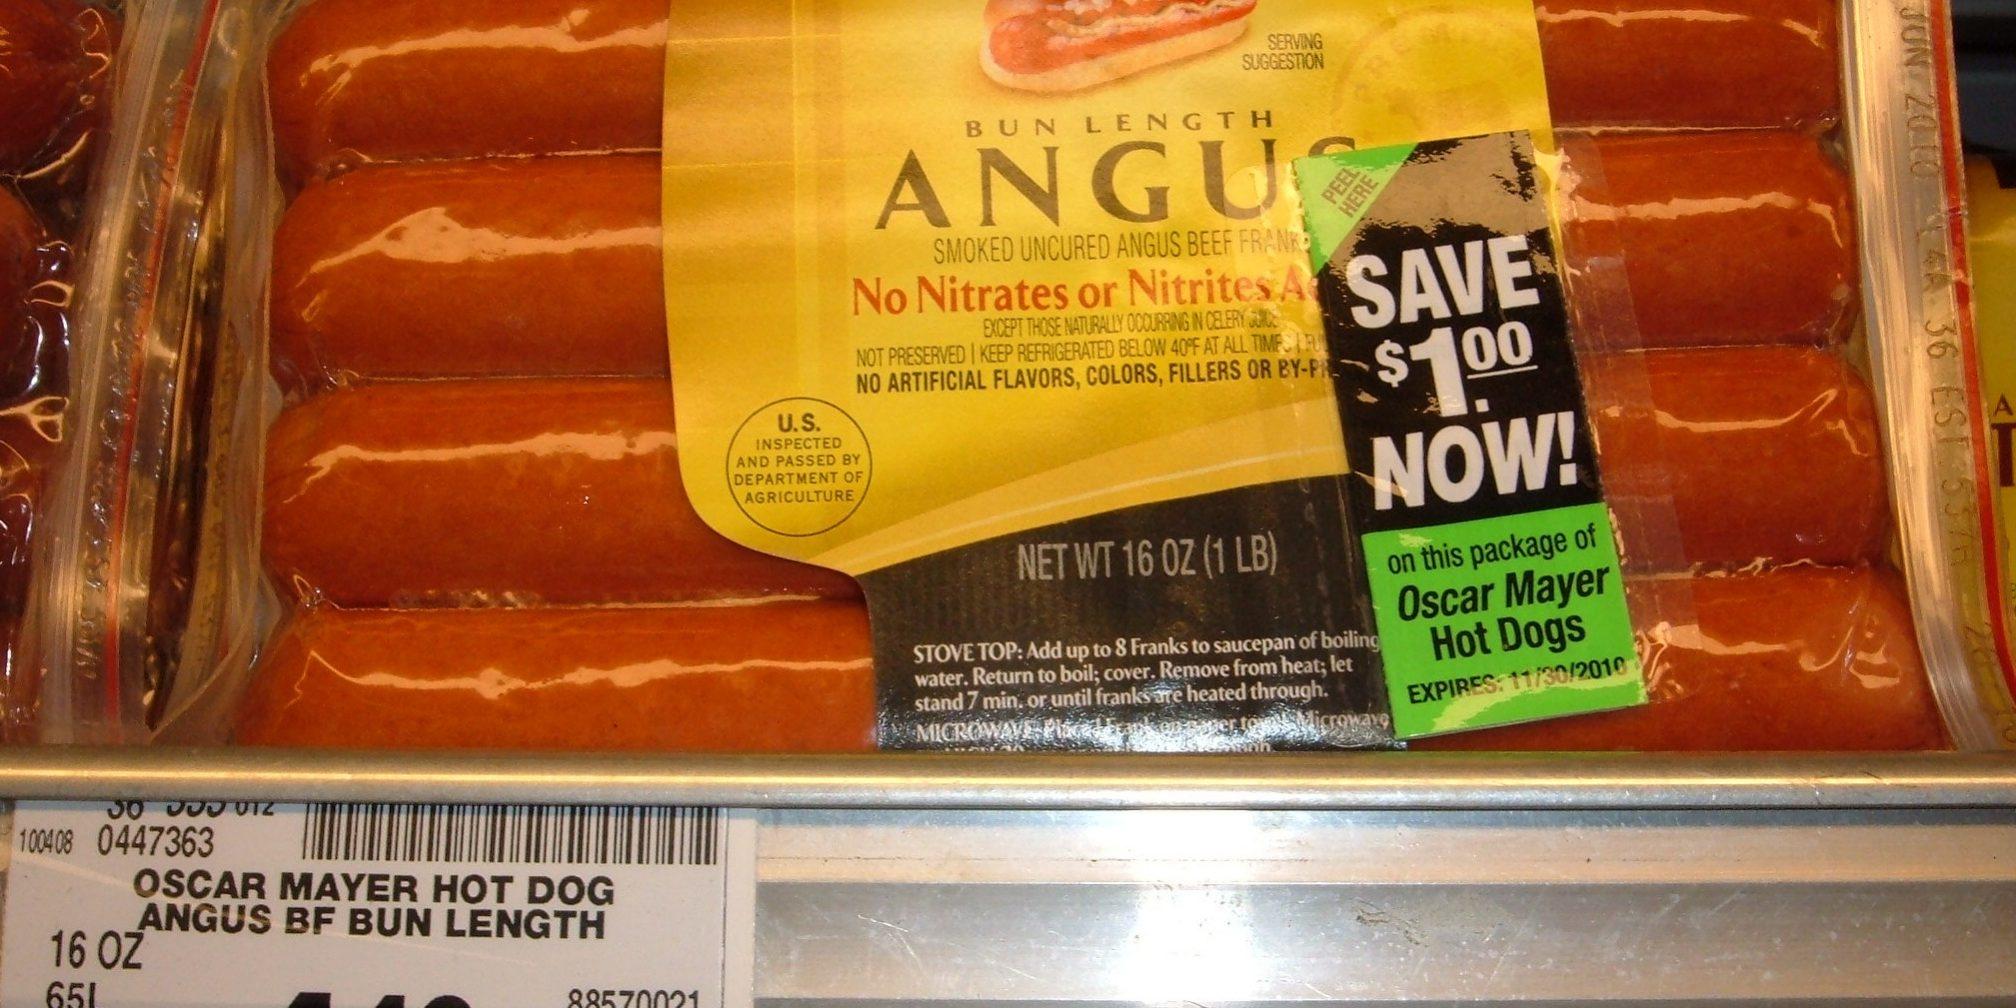 Free Oscar Mayer Hardwood Smoked Turkey Franks At Safeway - Grocery - Free Printable Oscar Mayer Coupons